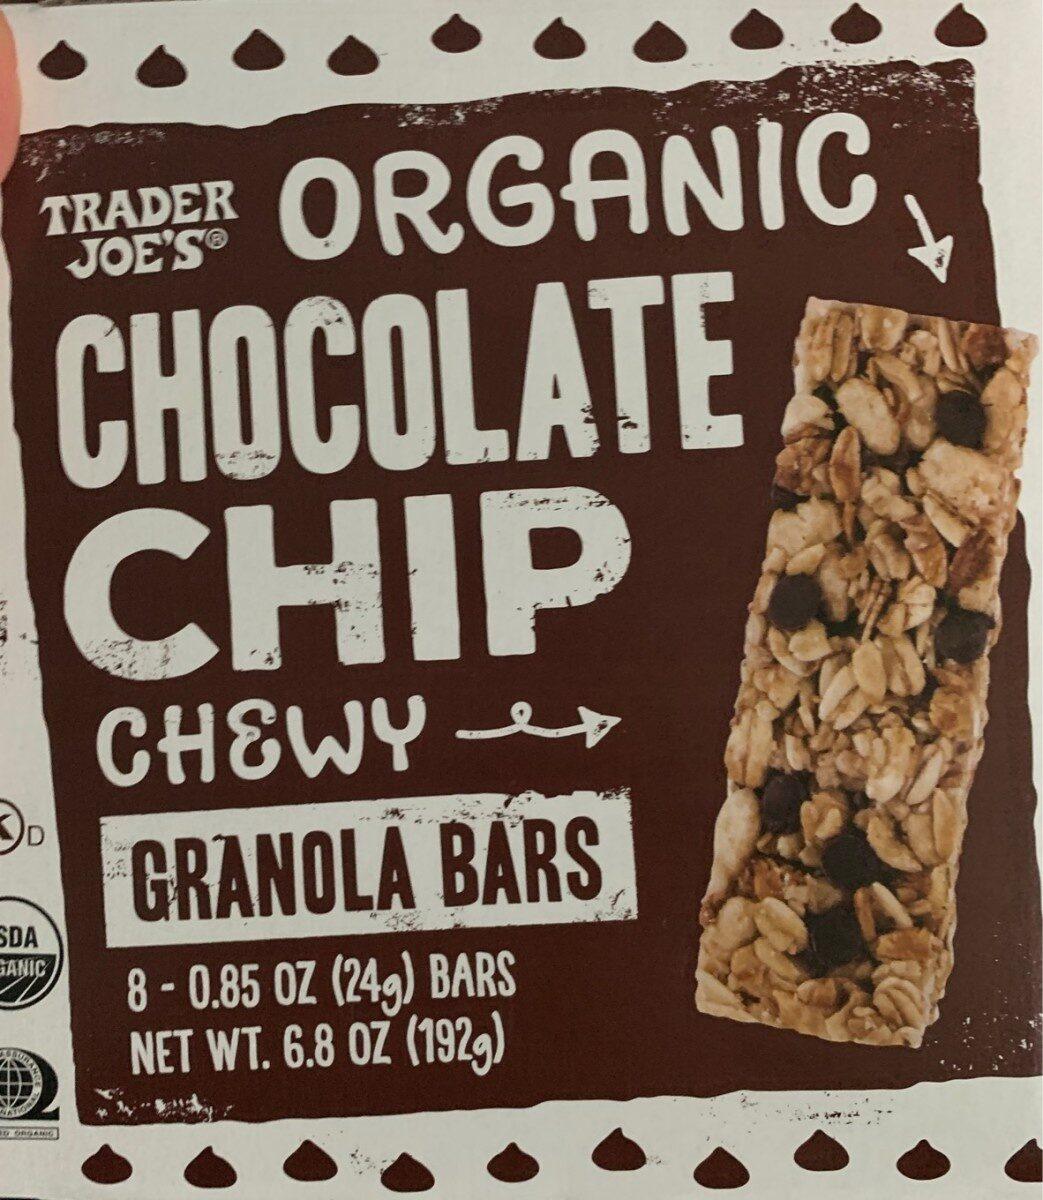 Organic chocolate chip granola bars - Product - en